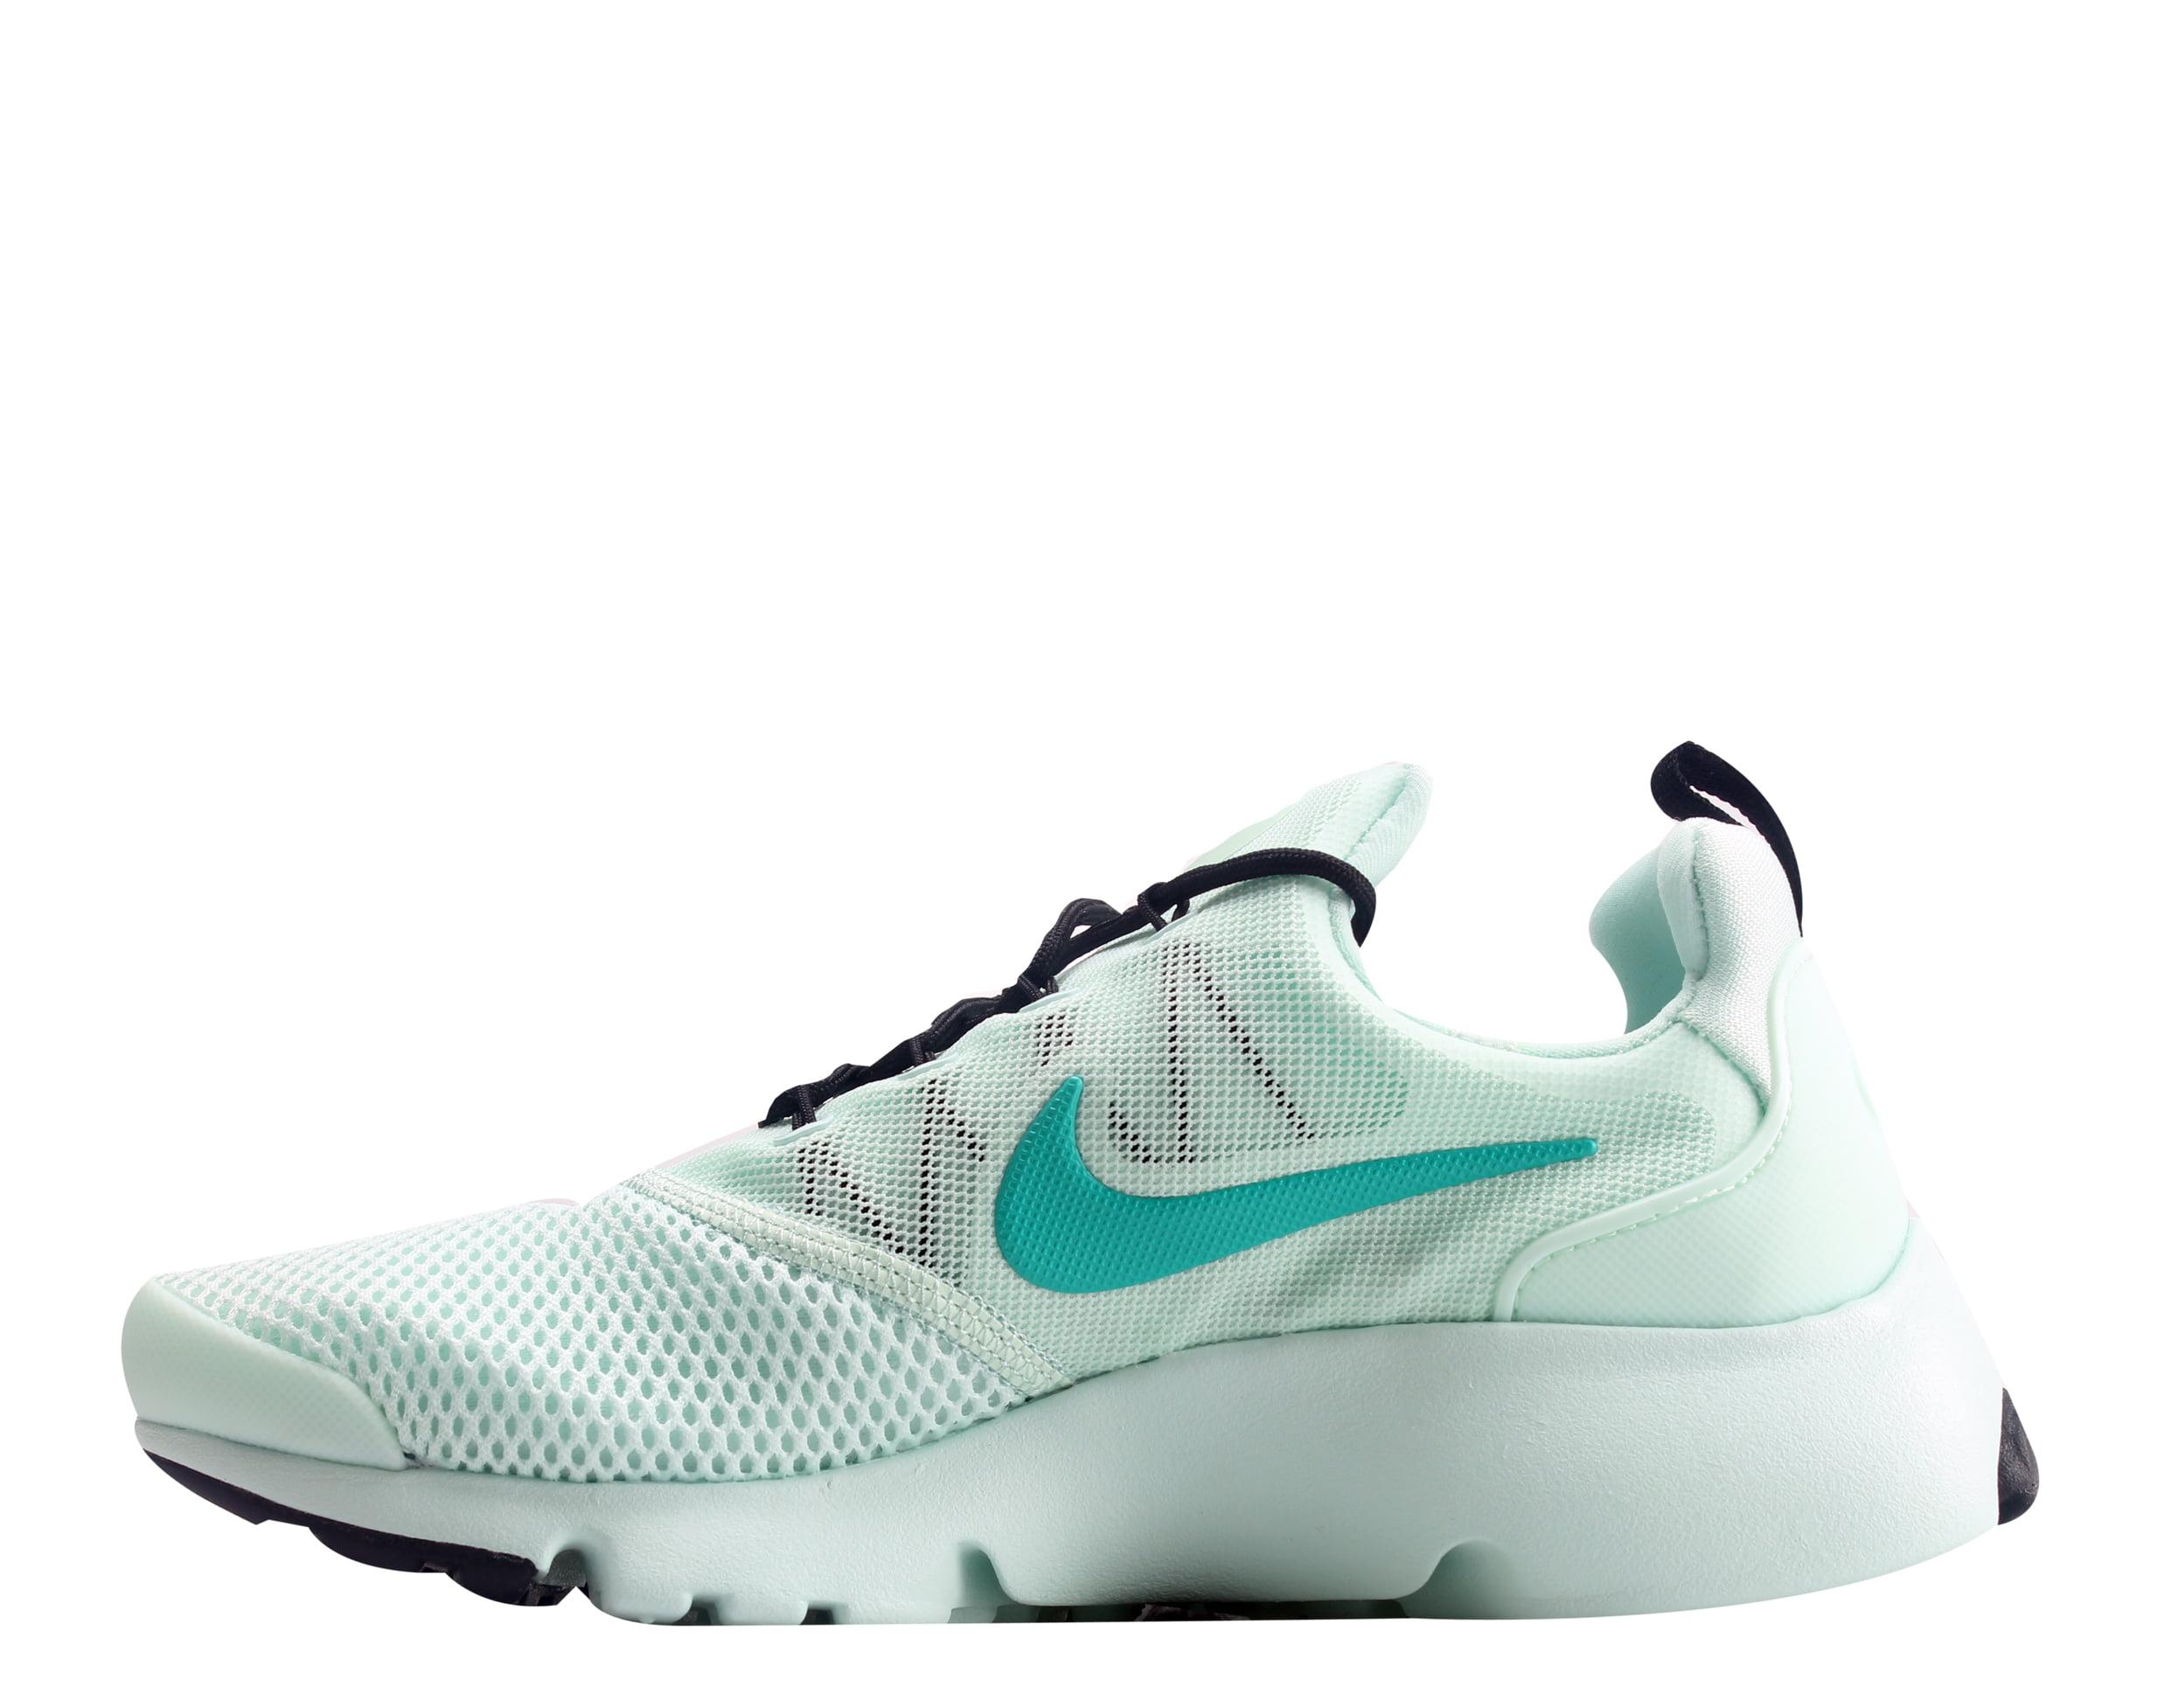 716555a20b8c3 Nike - Nike Presto Fly Igloo Clear Jade-Black Mint Women s Running Shoes  910569-300 - Walmart.com